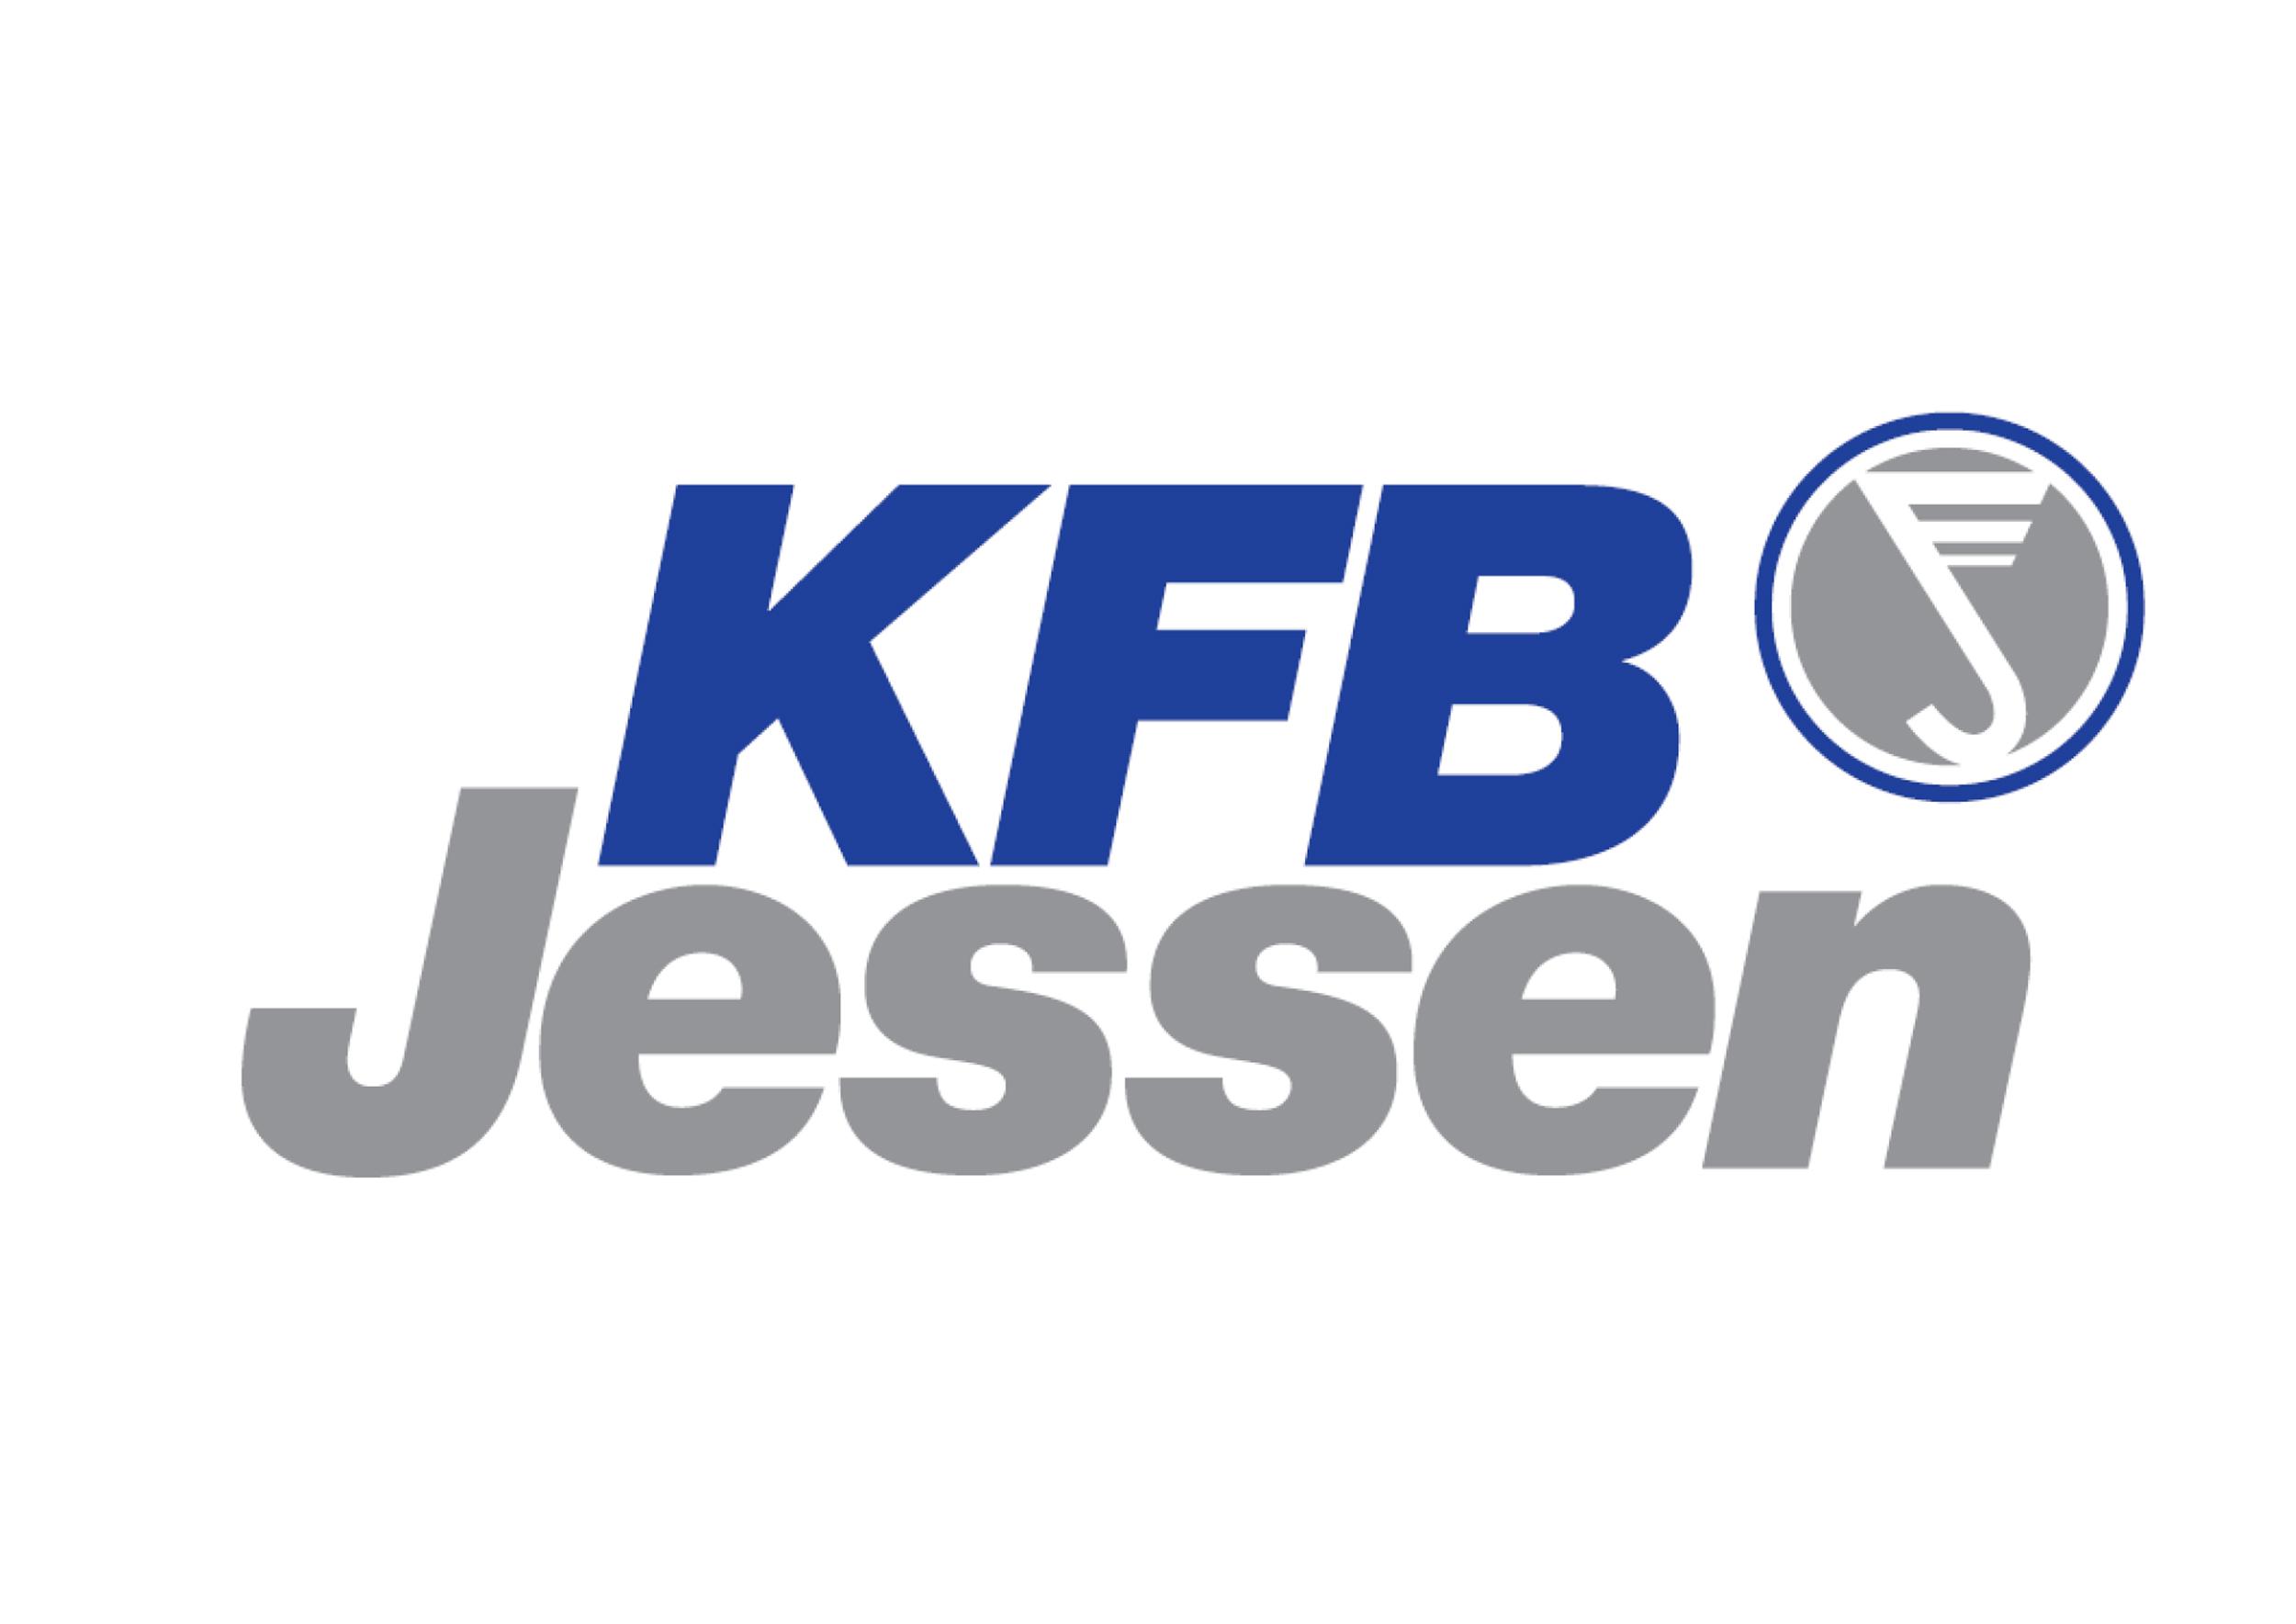 bzb_web_kfb_jessen_logo_2500x1768.jpg